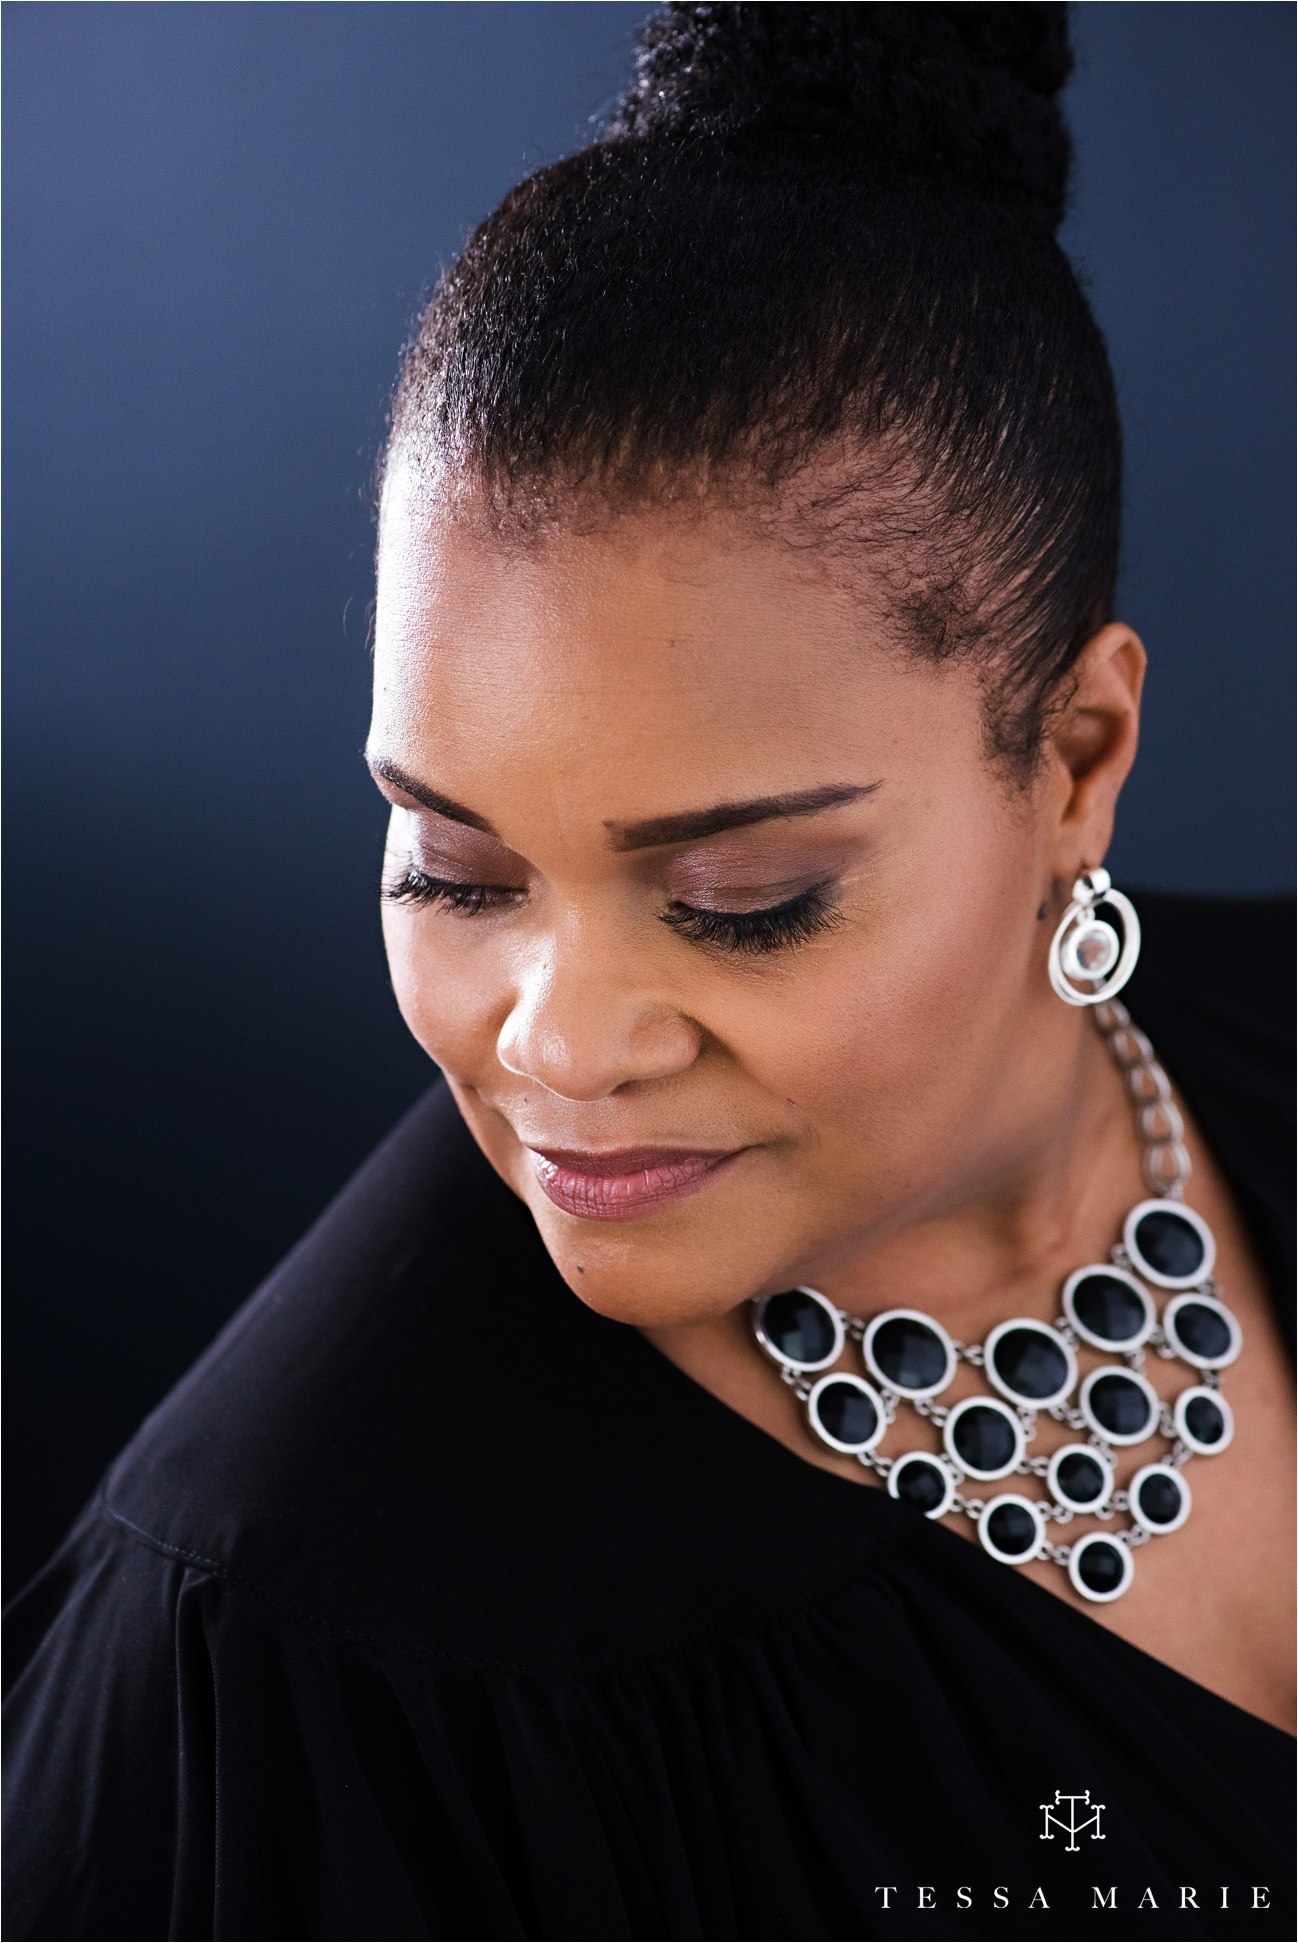 Tessa_marie_studios_womens_headshots_portraits_empowering_full_experience_something_for_mom_0052